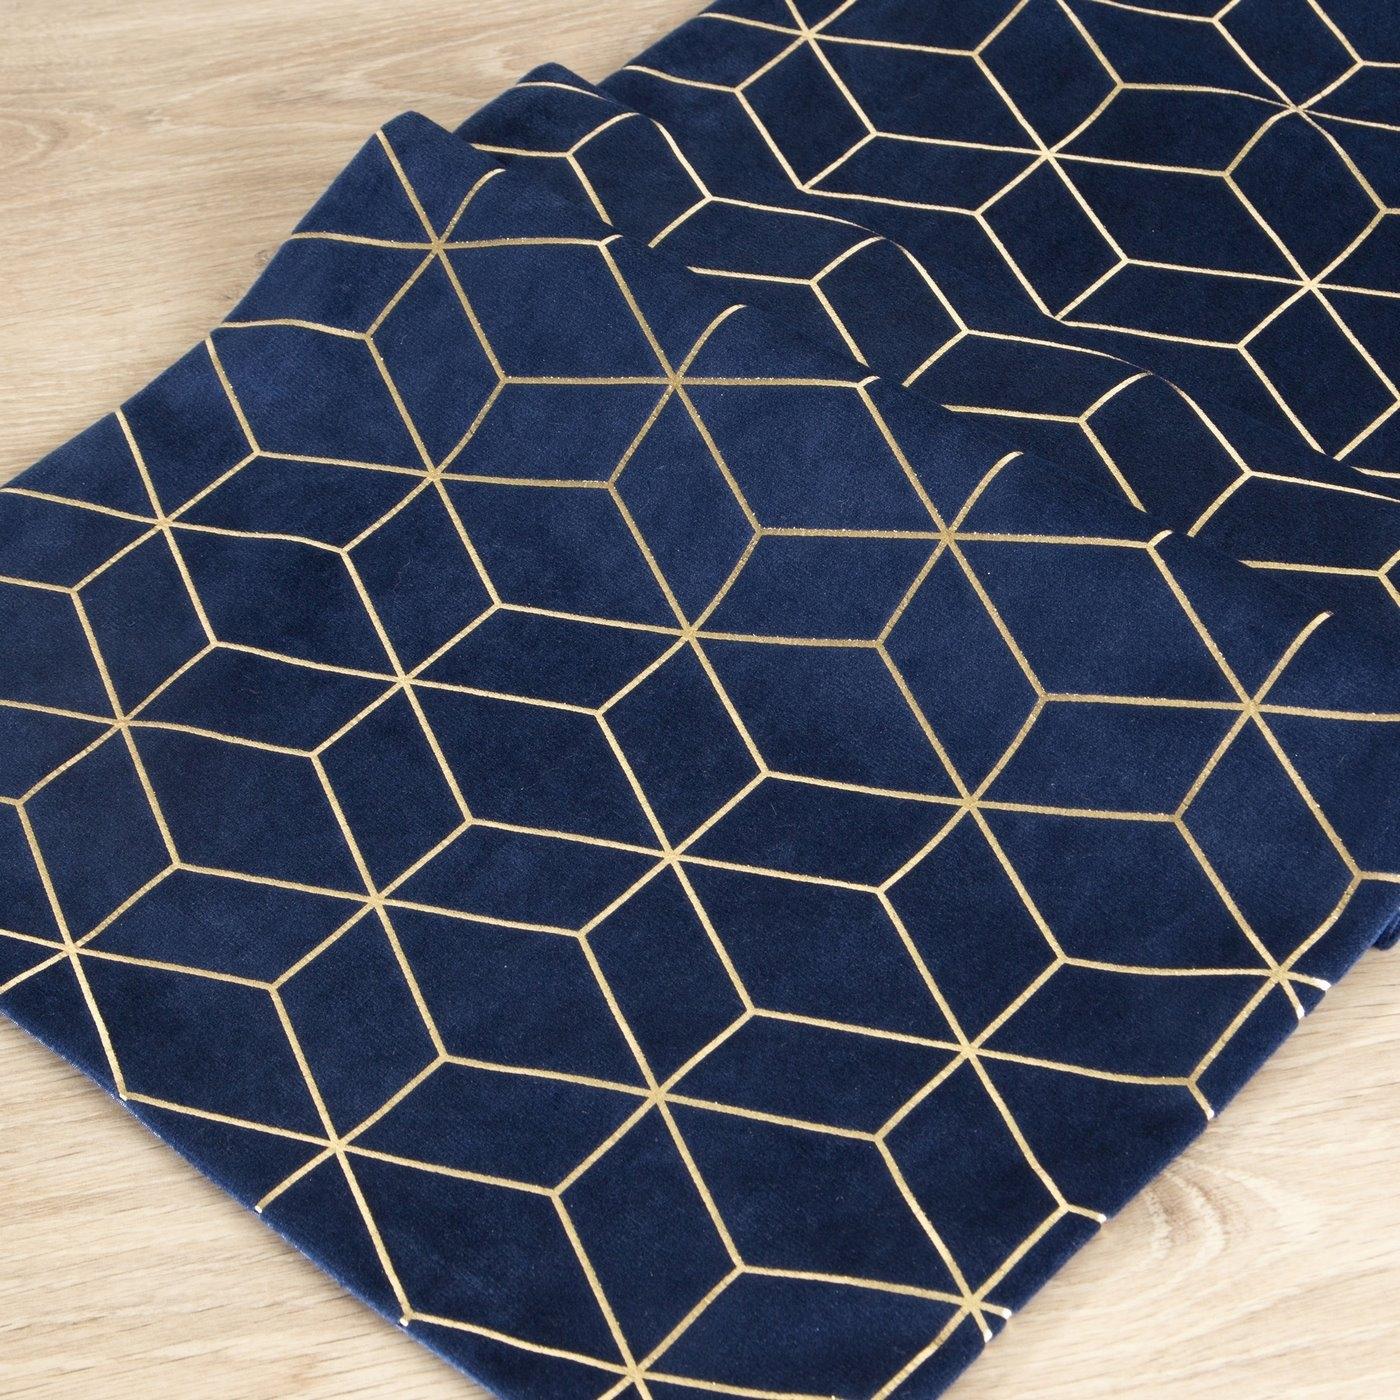 Traversa masa Suzi Velvet Bleumarin / Auriu, 35 x 140 cm poza